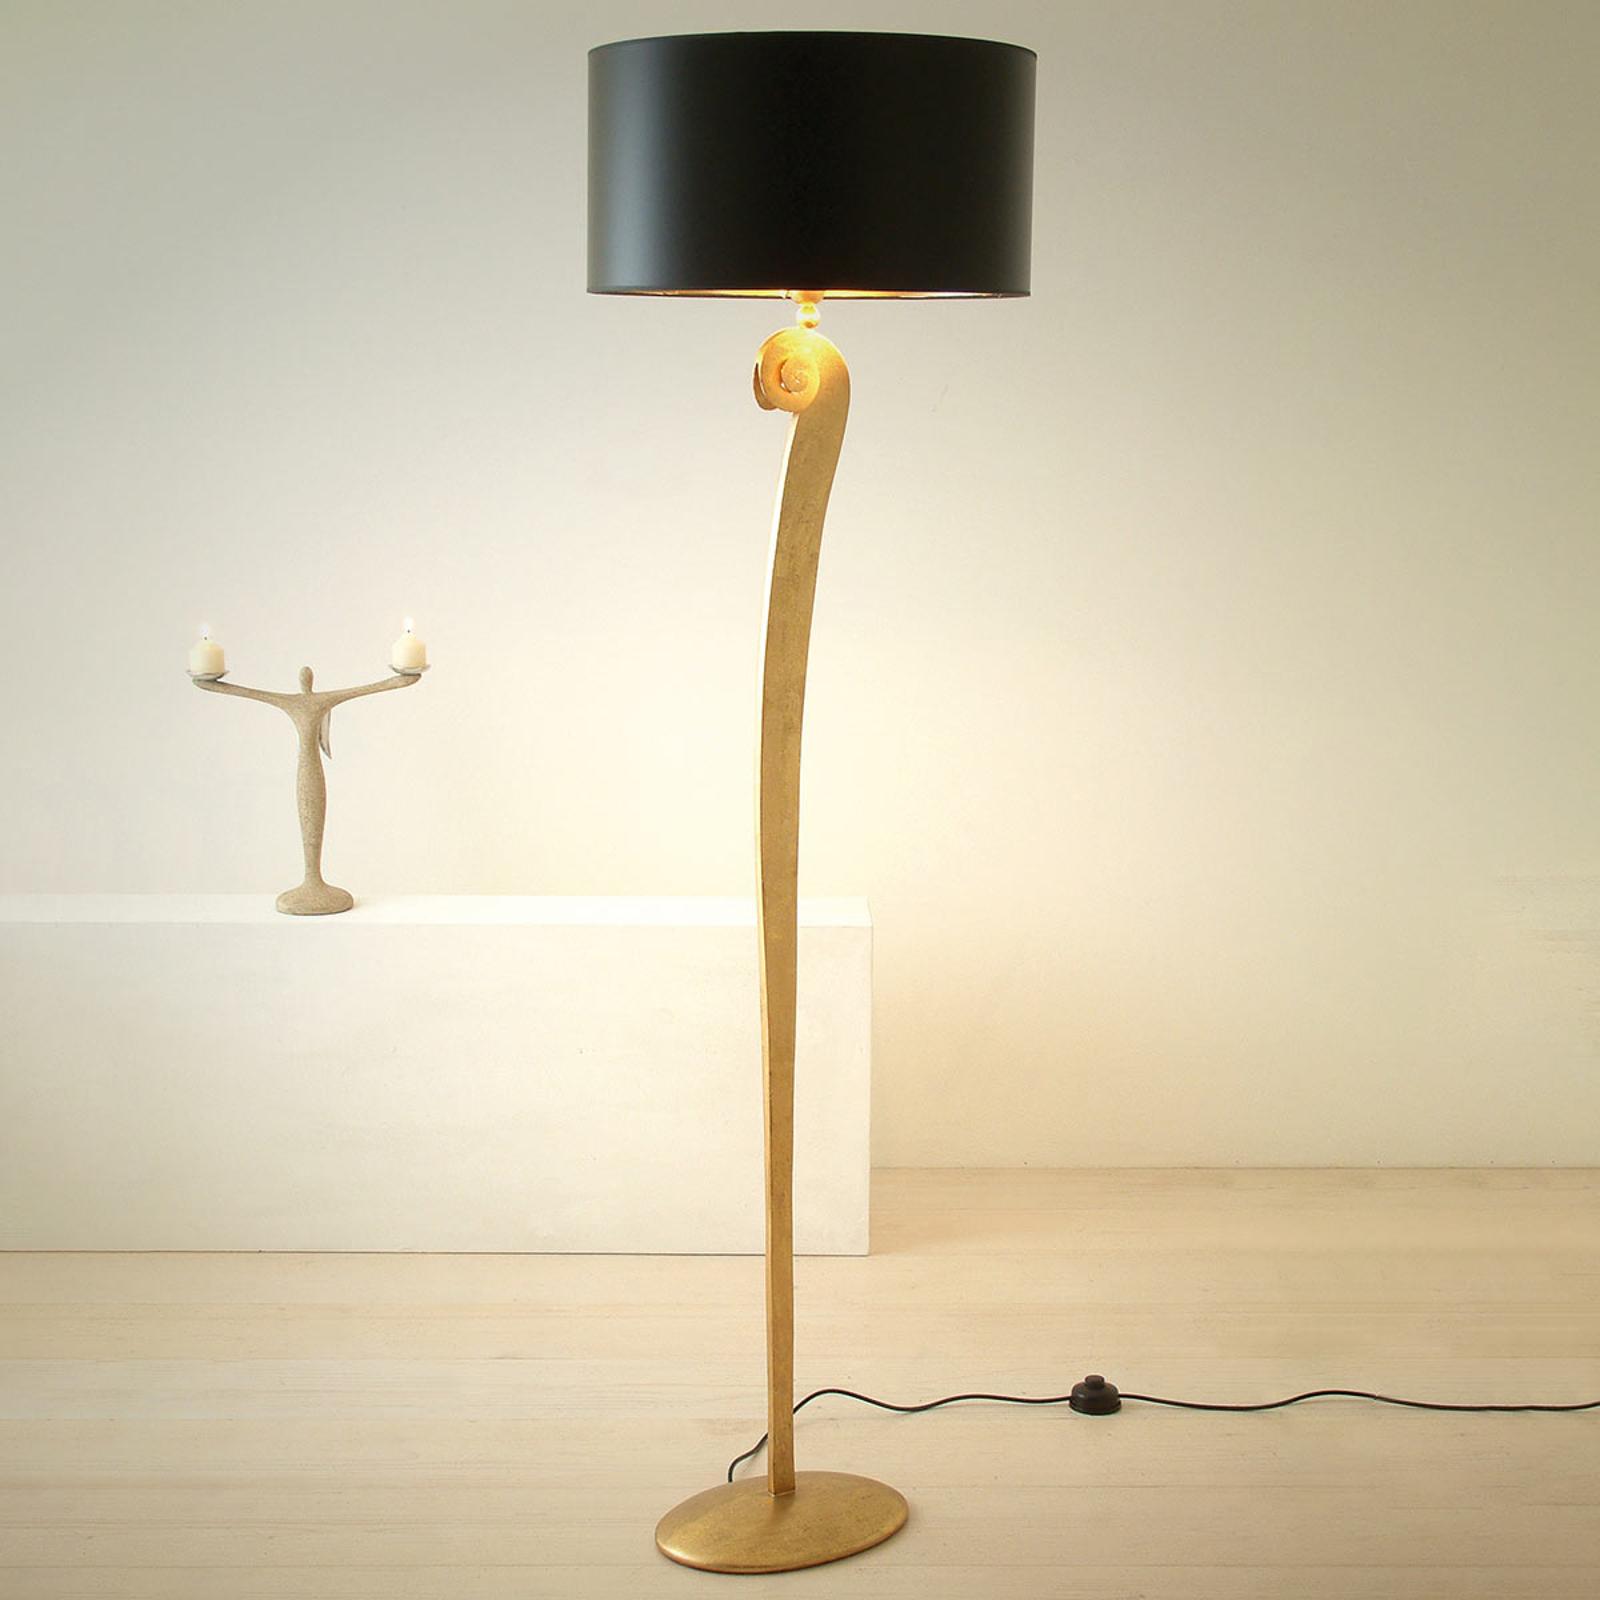 Elegante vloerlamp LORGOLIOSO in goud-zwart